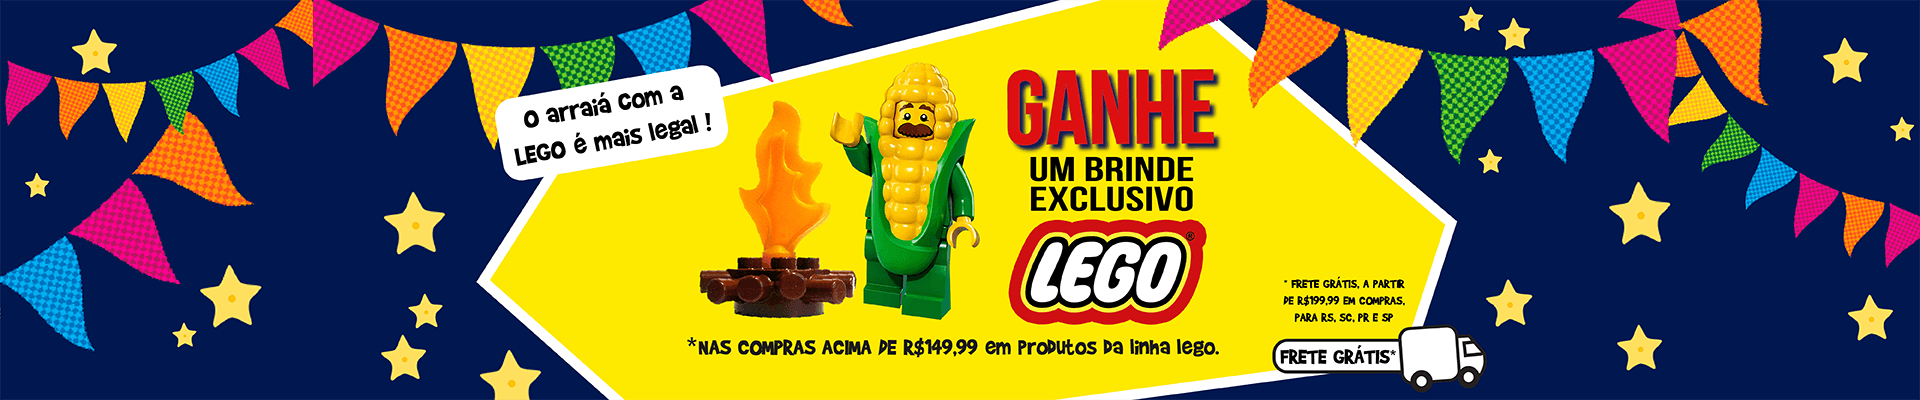 LEGO Brinde + Frete Grátis